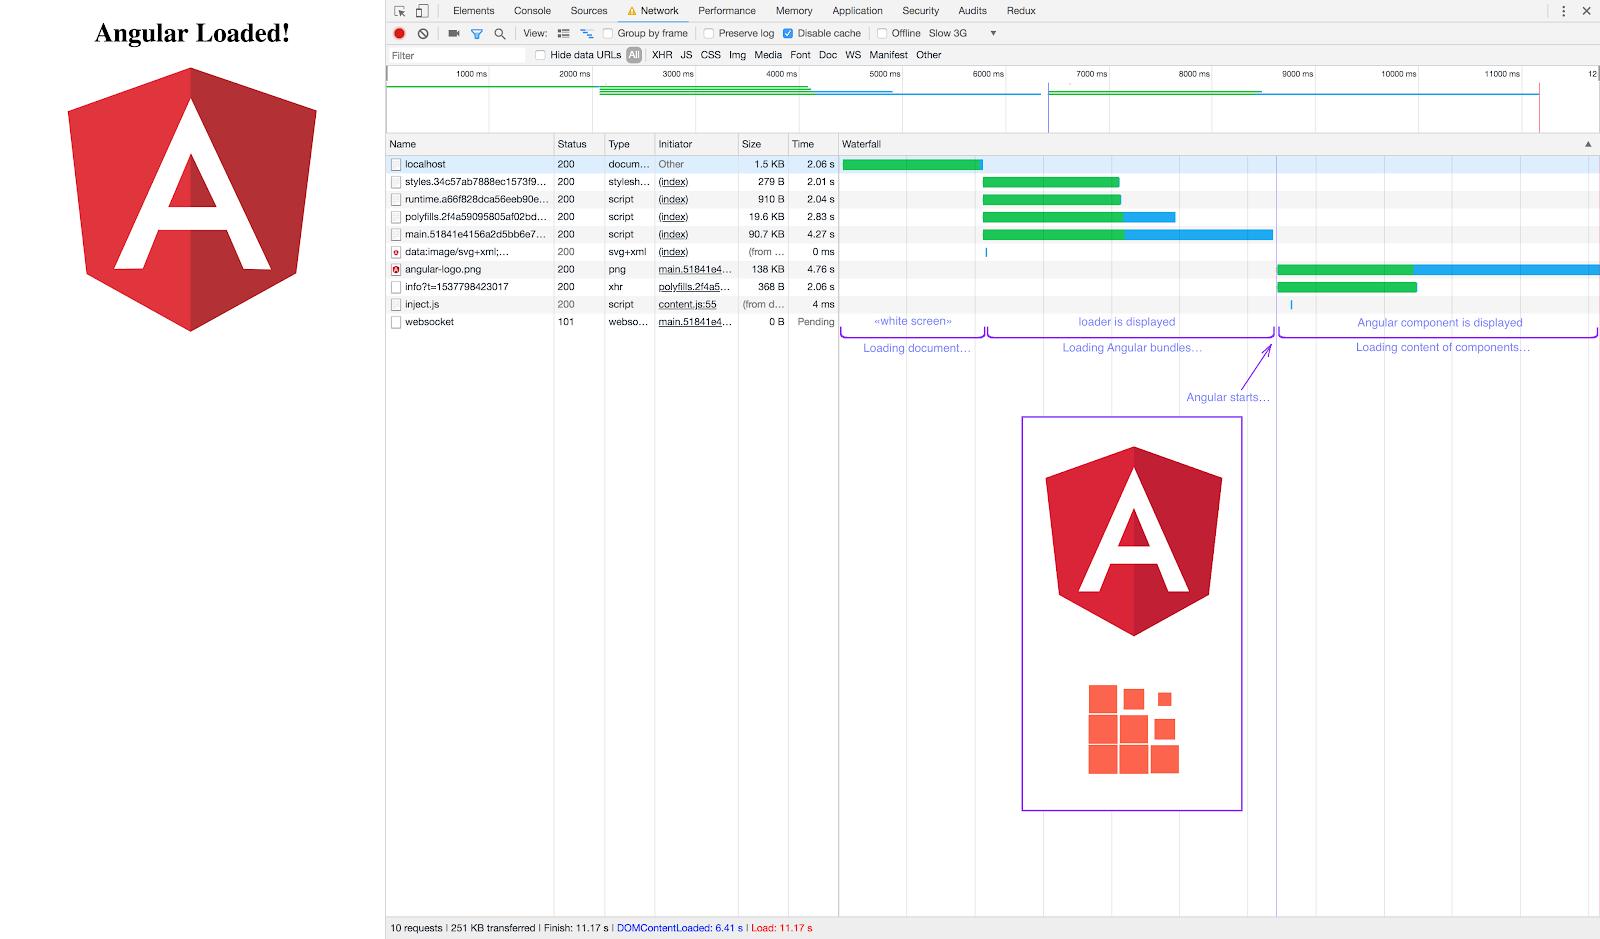 angular-application-preloading-page